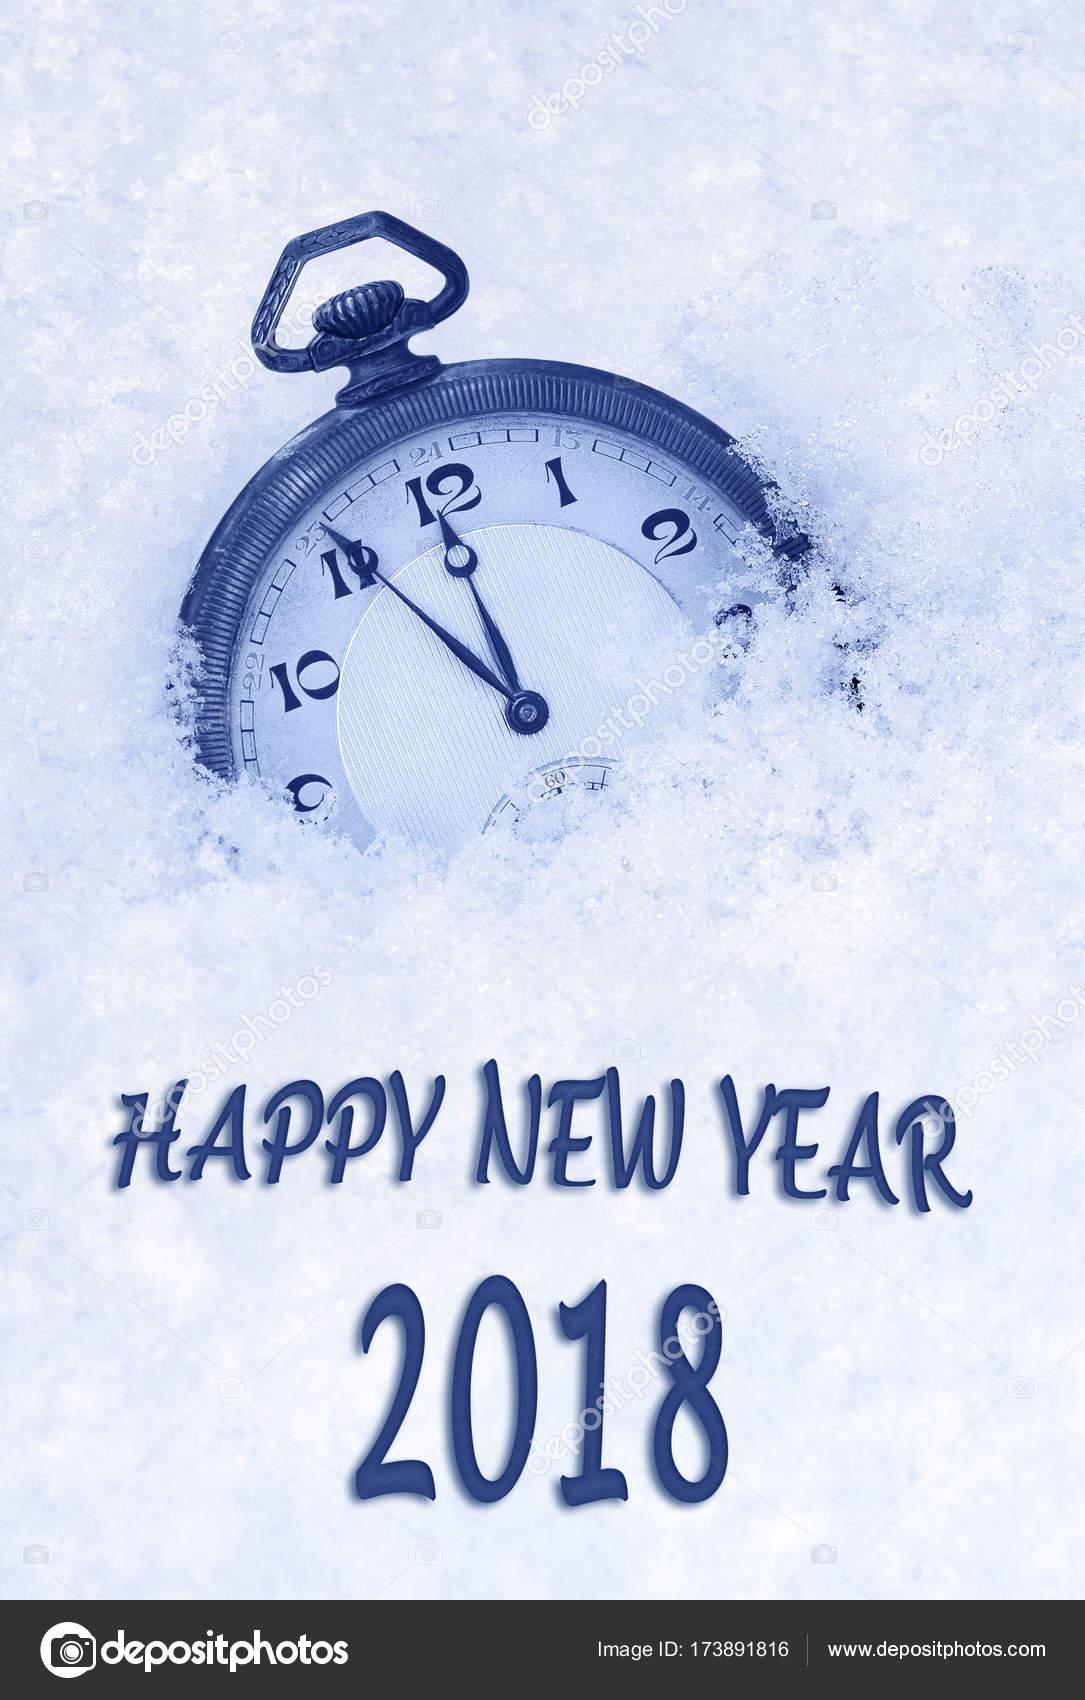 2018 new year greeting card in english language pocket watch in 2018 new year greeting card in english language pocket watch in snow 2018 new year 2018 greeting photo by brozova m4hsunfo